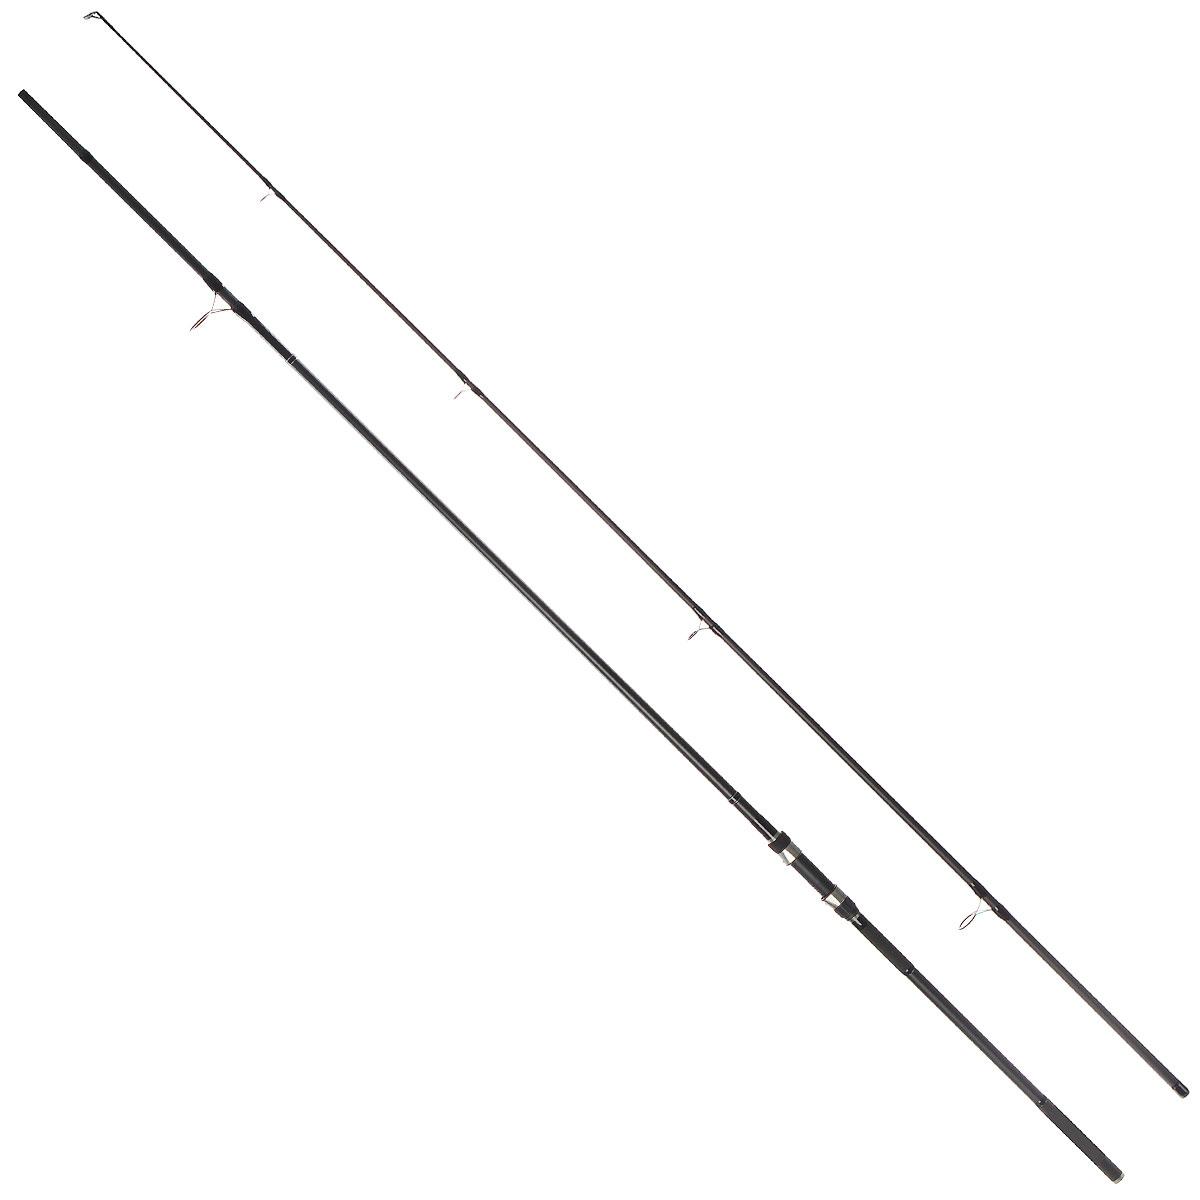 Удилище карповое Daiwa Black Widow Carp, 3,9 м, 5 lbs